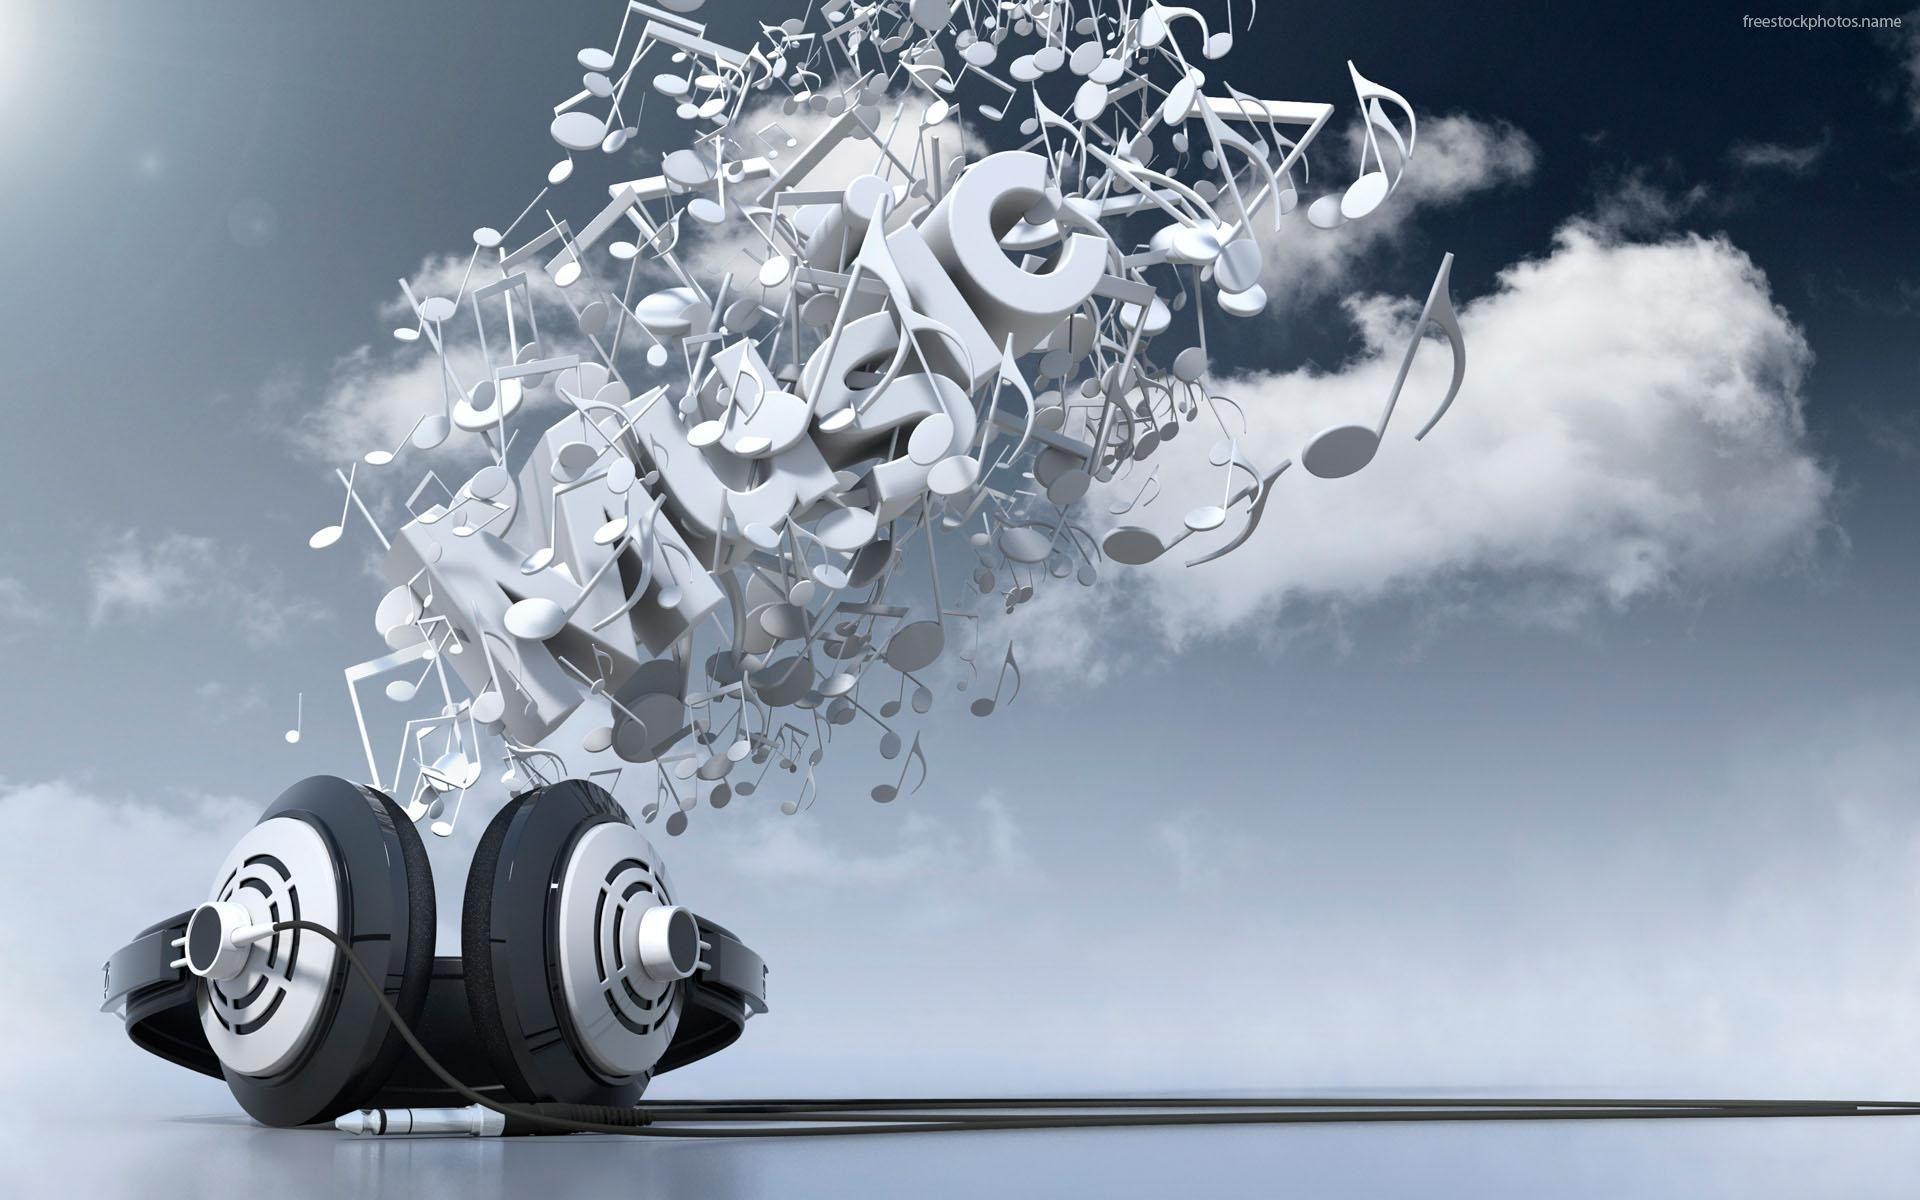 Simple Wallpaper Music Portrait - 0cc43a3a63a86eeb5b7bac364d1dbd78  You Should Have_376542.jpg